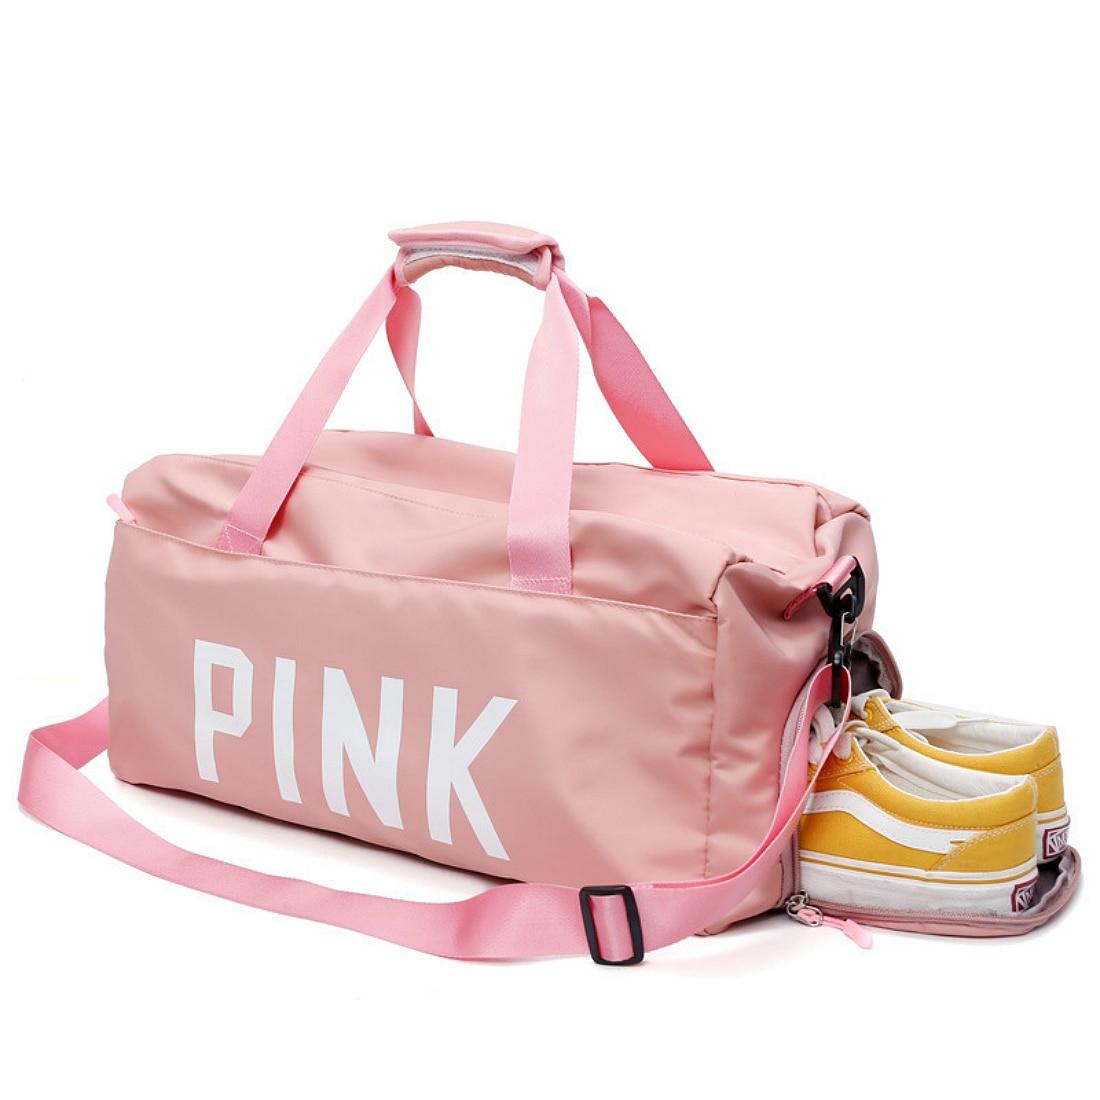 8d9567e4688 2018 New BLACK Bag Girl Outdoor Sports Bag with Shoes Storage Duffel Bag  Women Gym Yoga